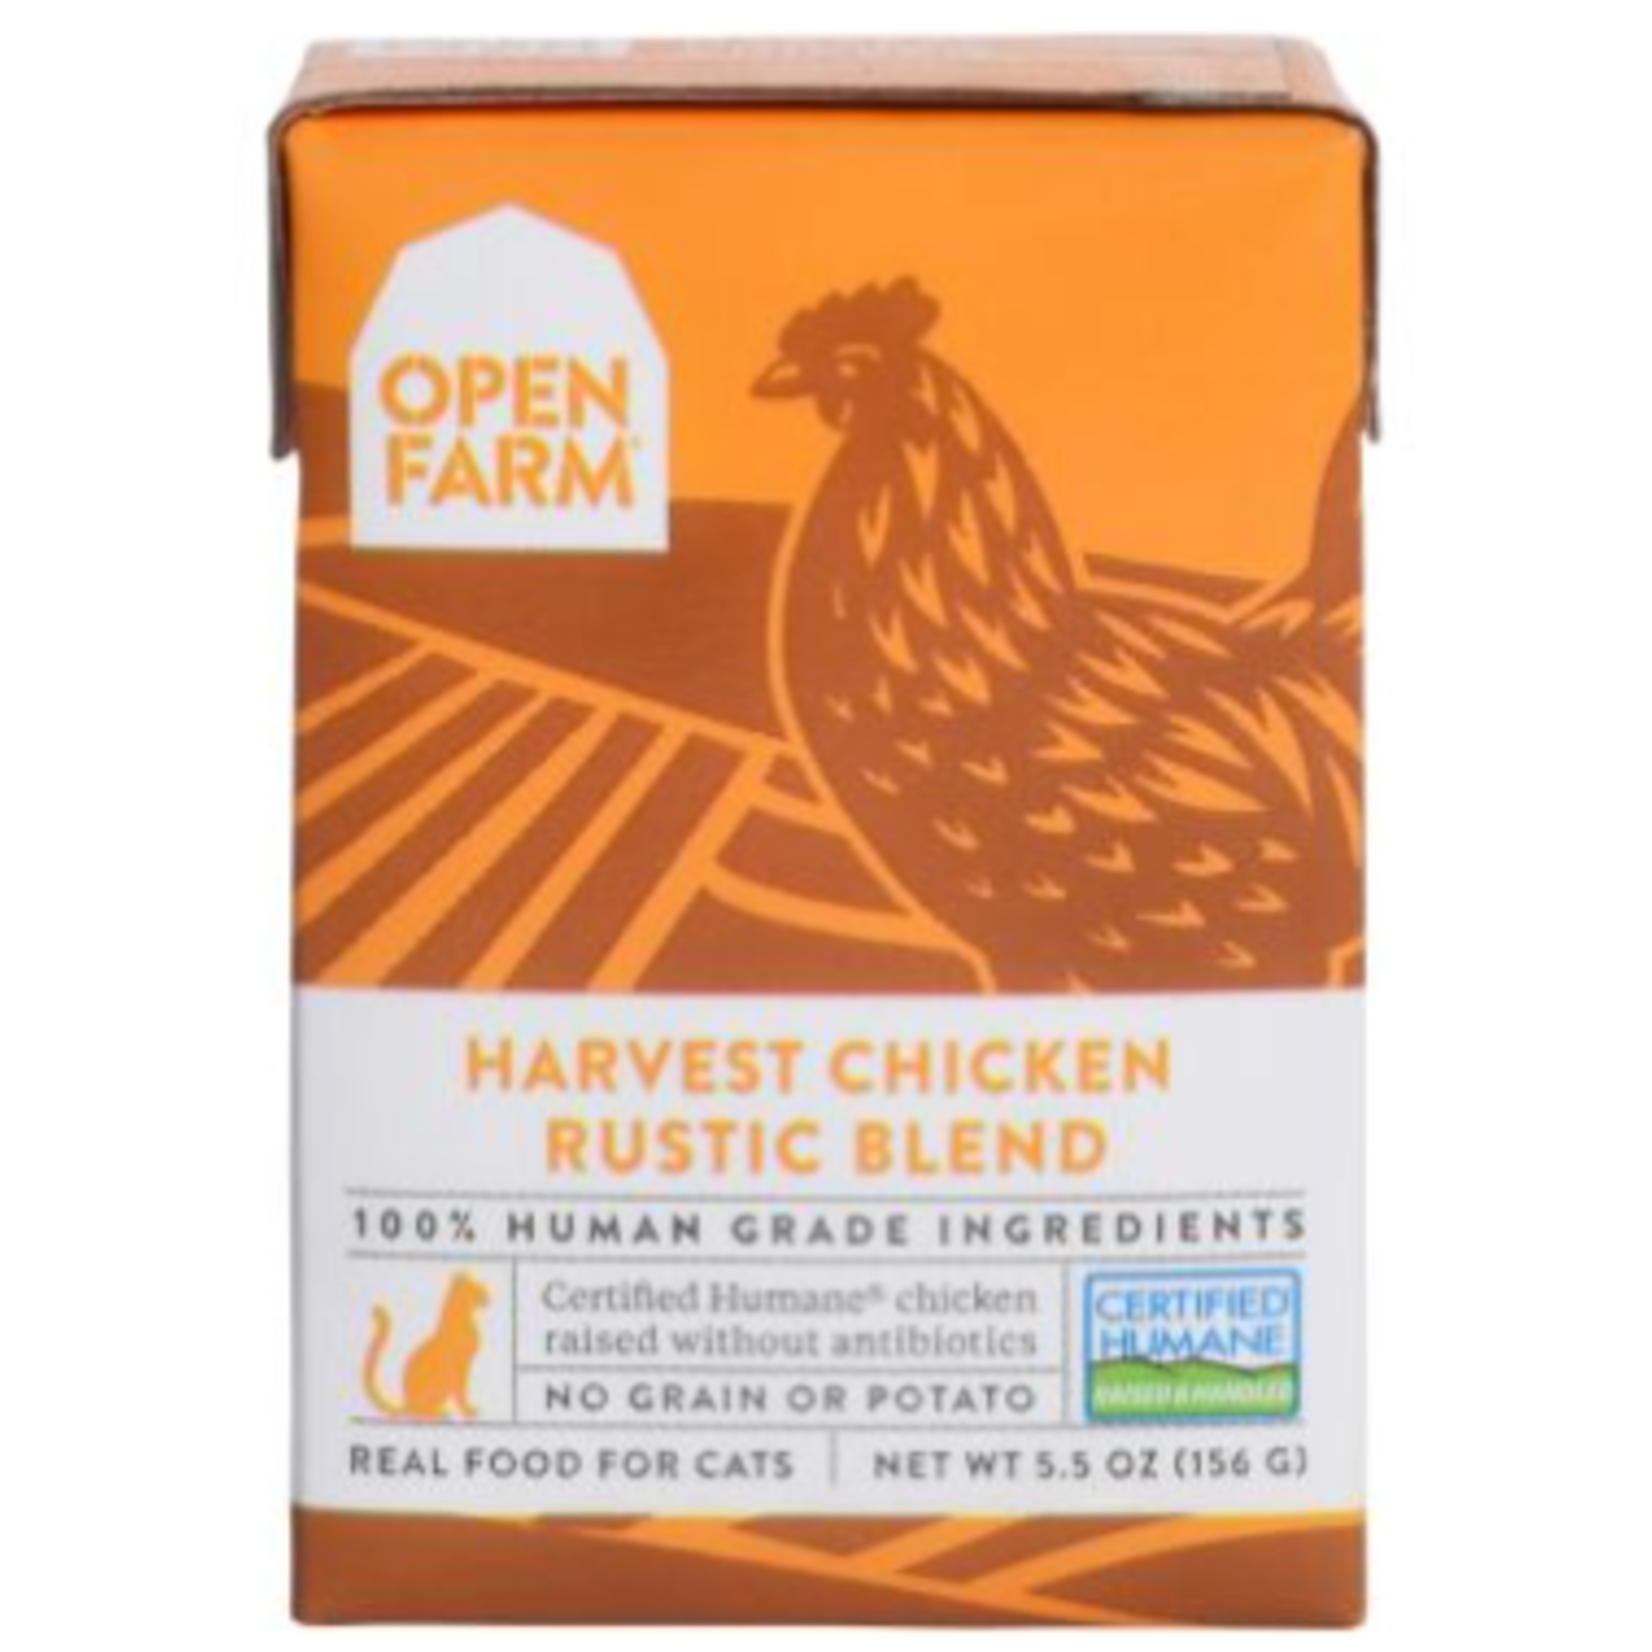 Open Farm Harvest Chicken Rustic Blend-5.5 oz